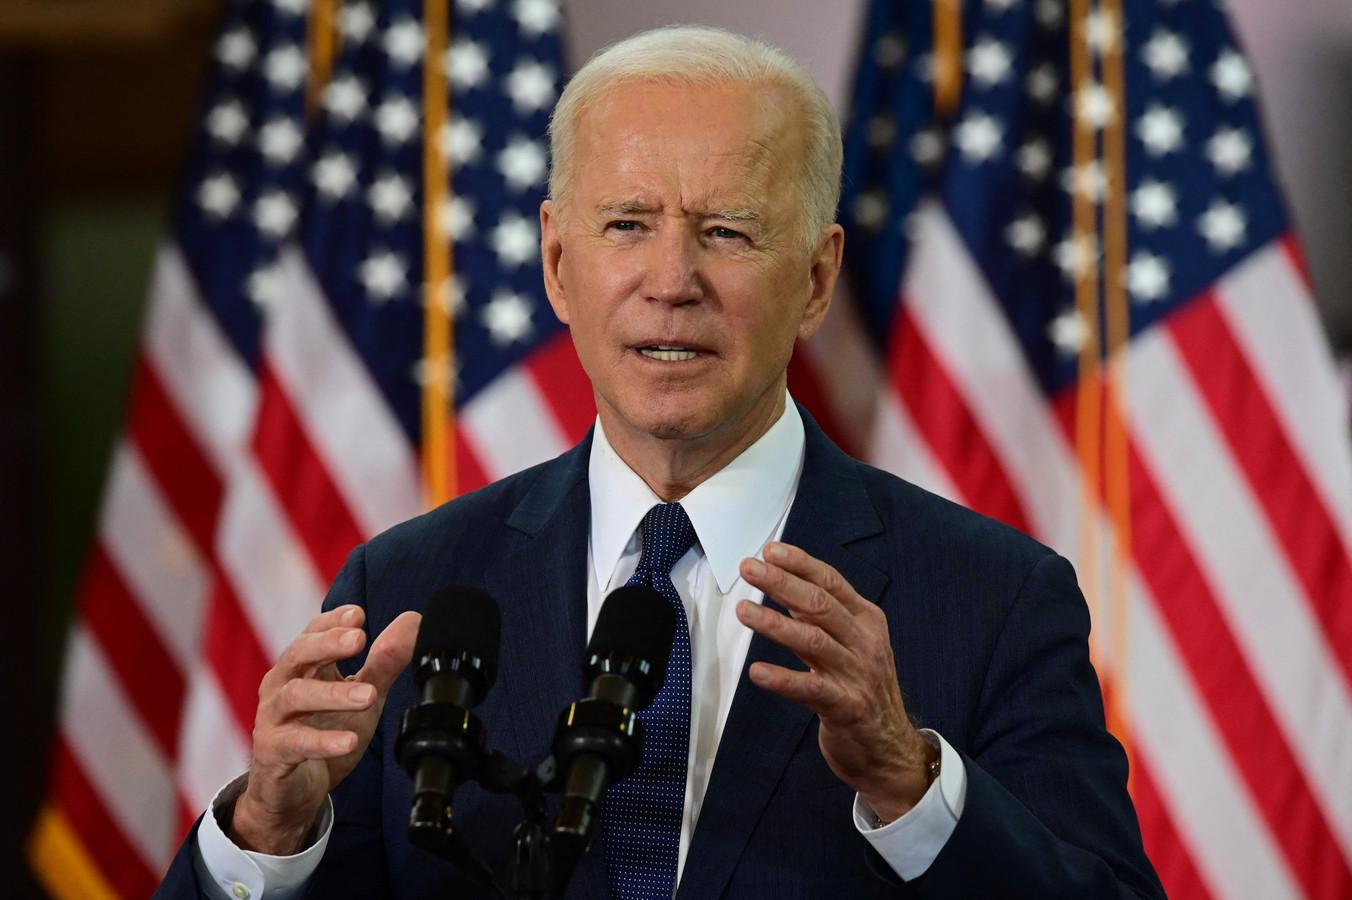 Le président Biden